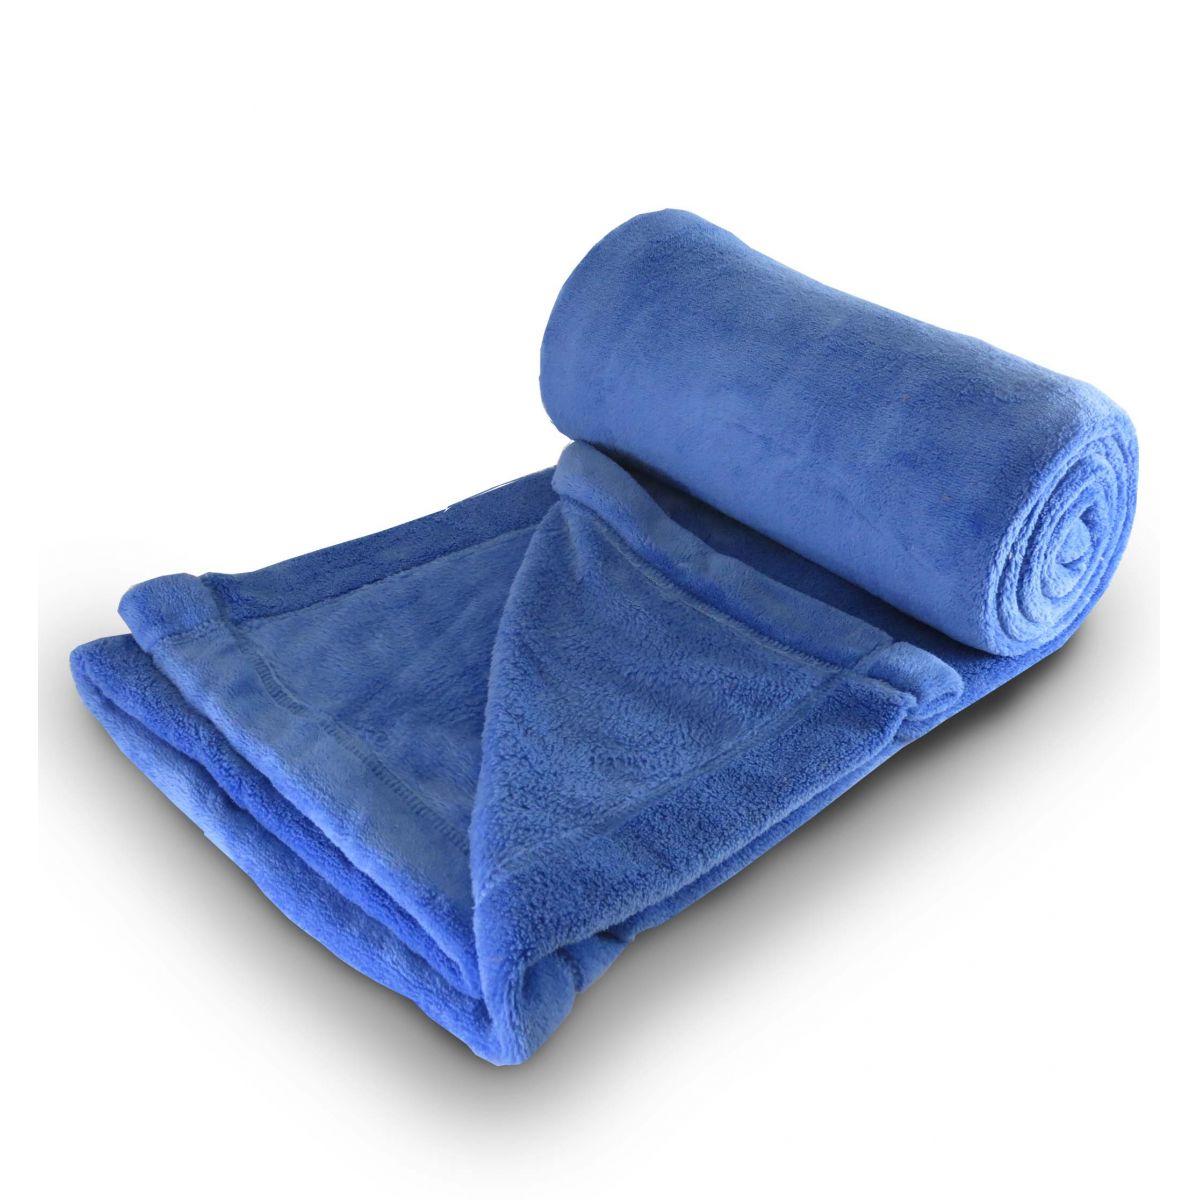 Cobertor de Microfibra Queen - Azul